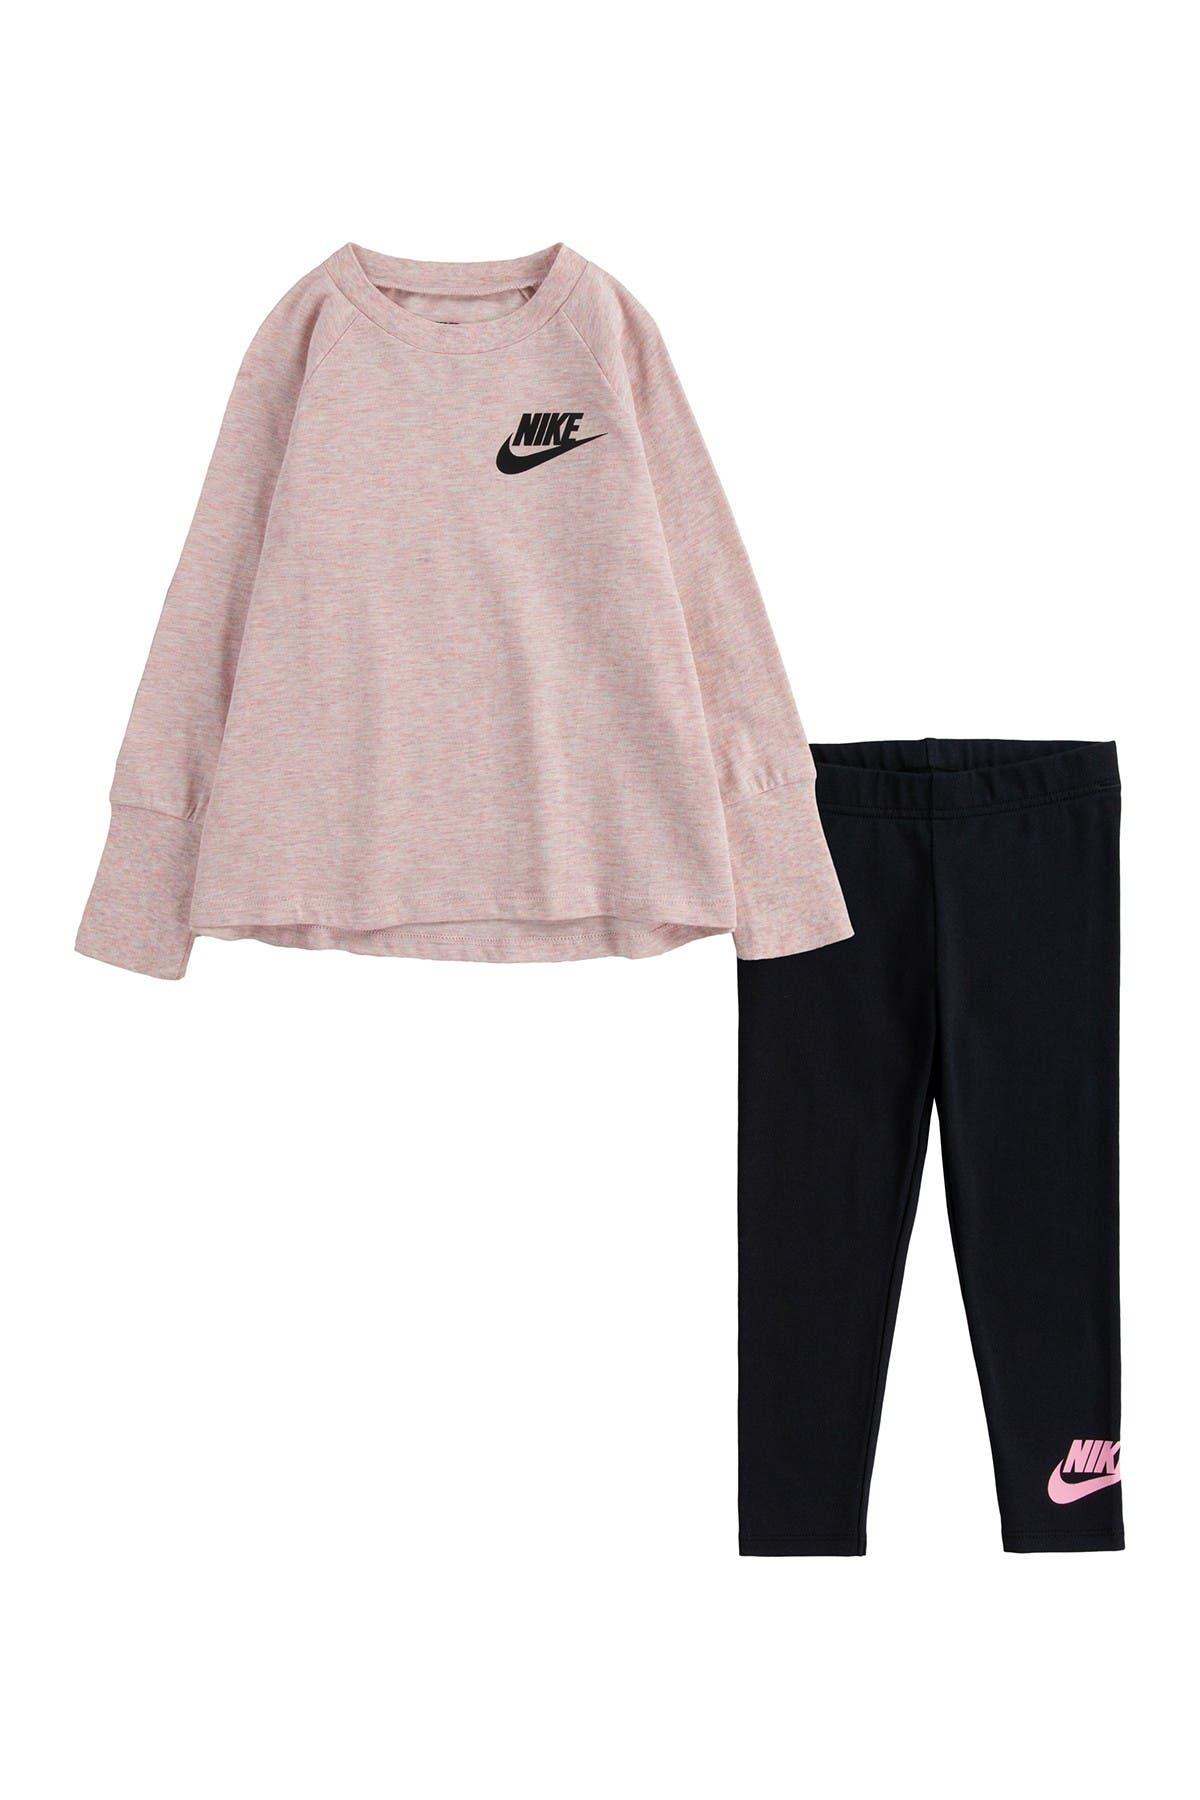 Image of Nike Tunic T-Shirt and Leggings 2-Piece Set